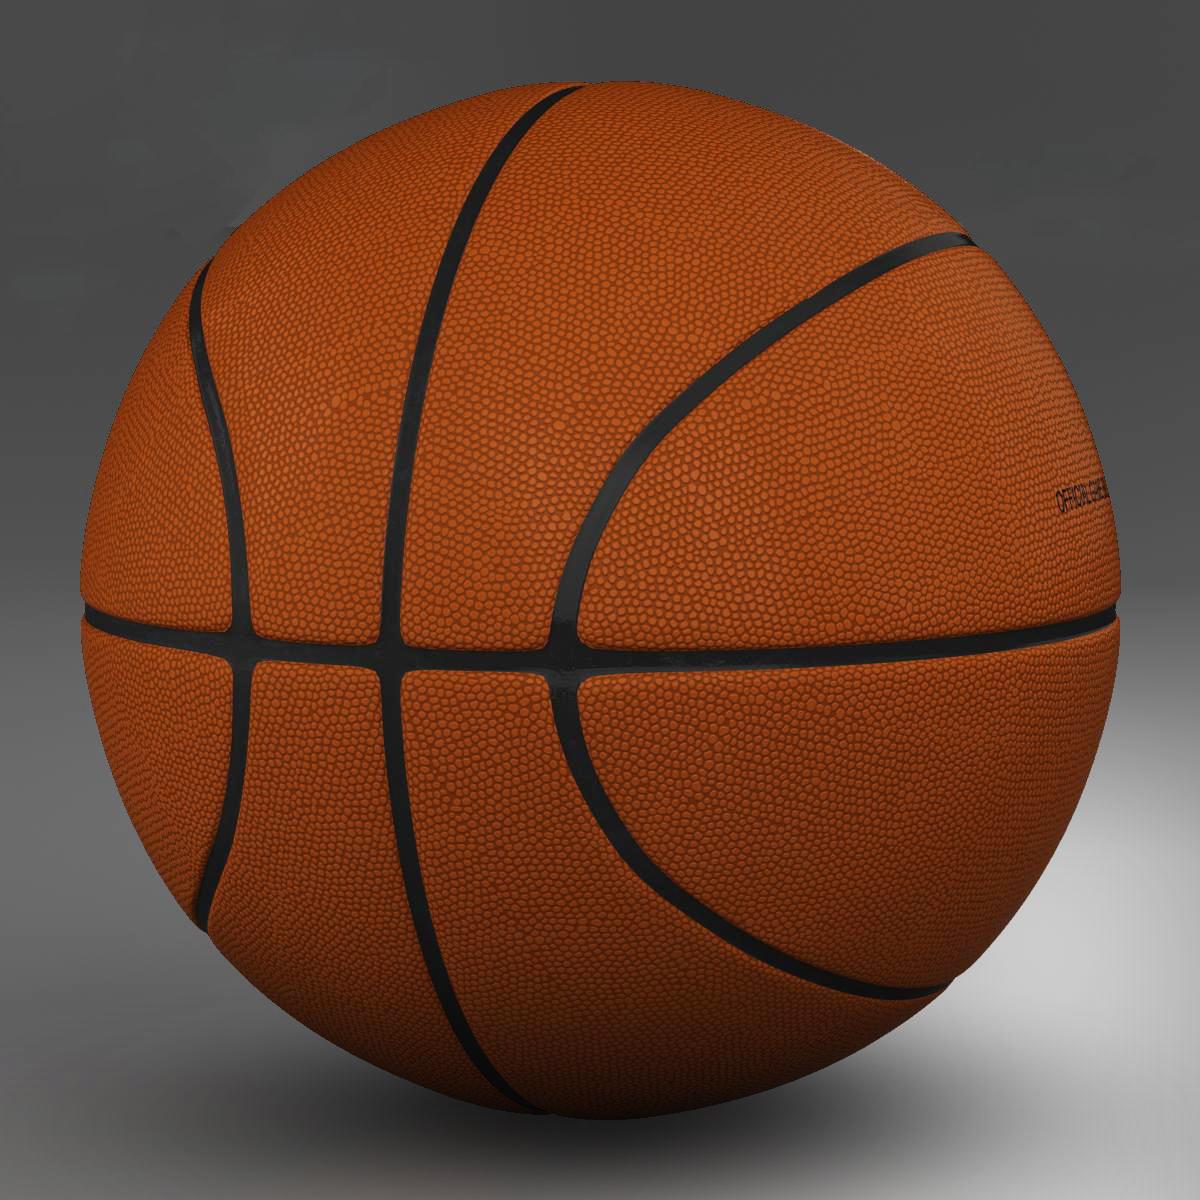 standard basketball ball 3d model 3ds max fbx c4d ma mb obj 164707